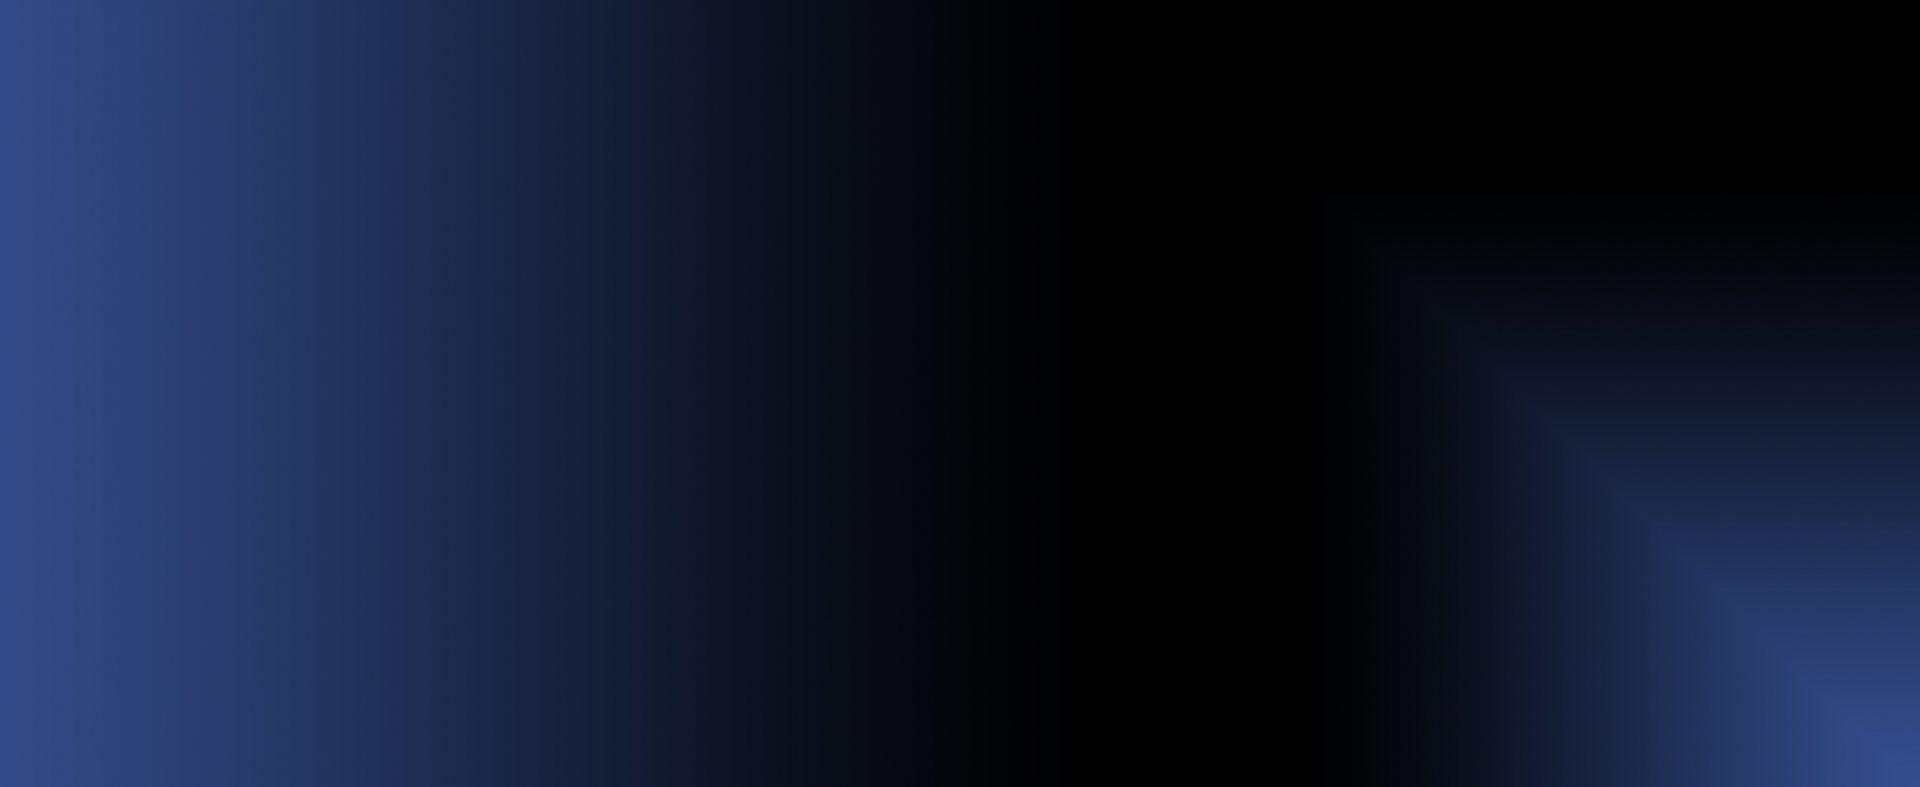 accuniq analizador de composicion corporal belium estetica spain